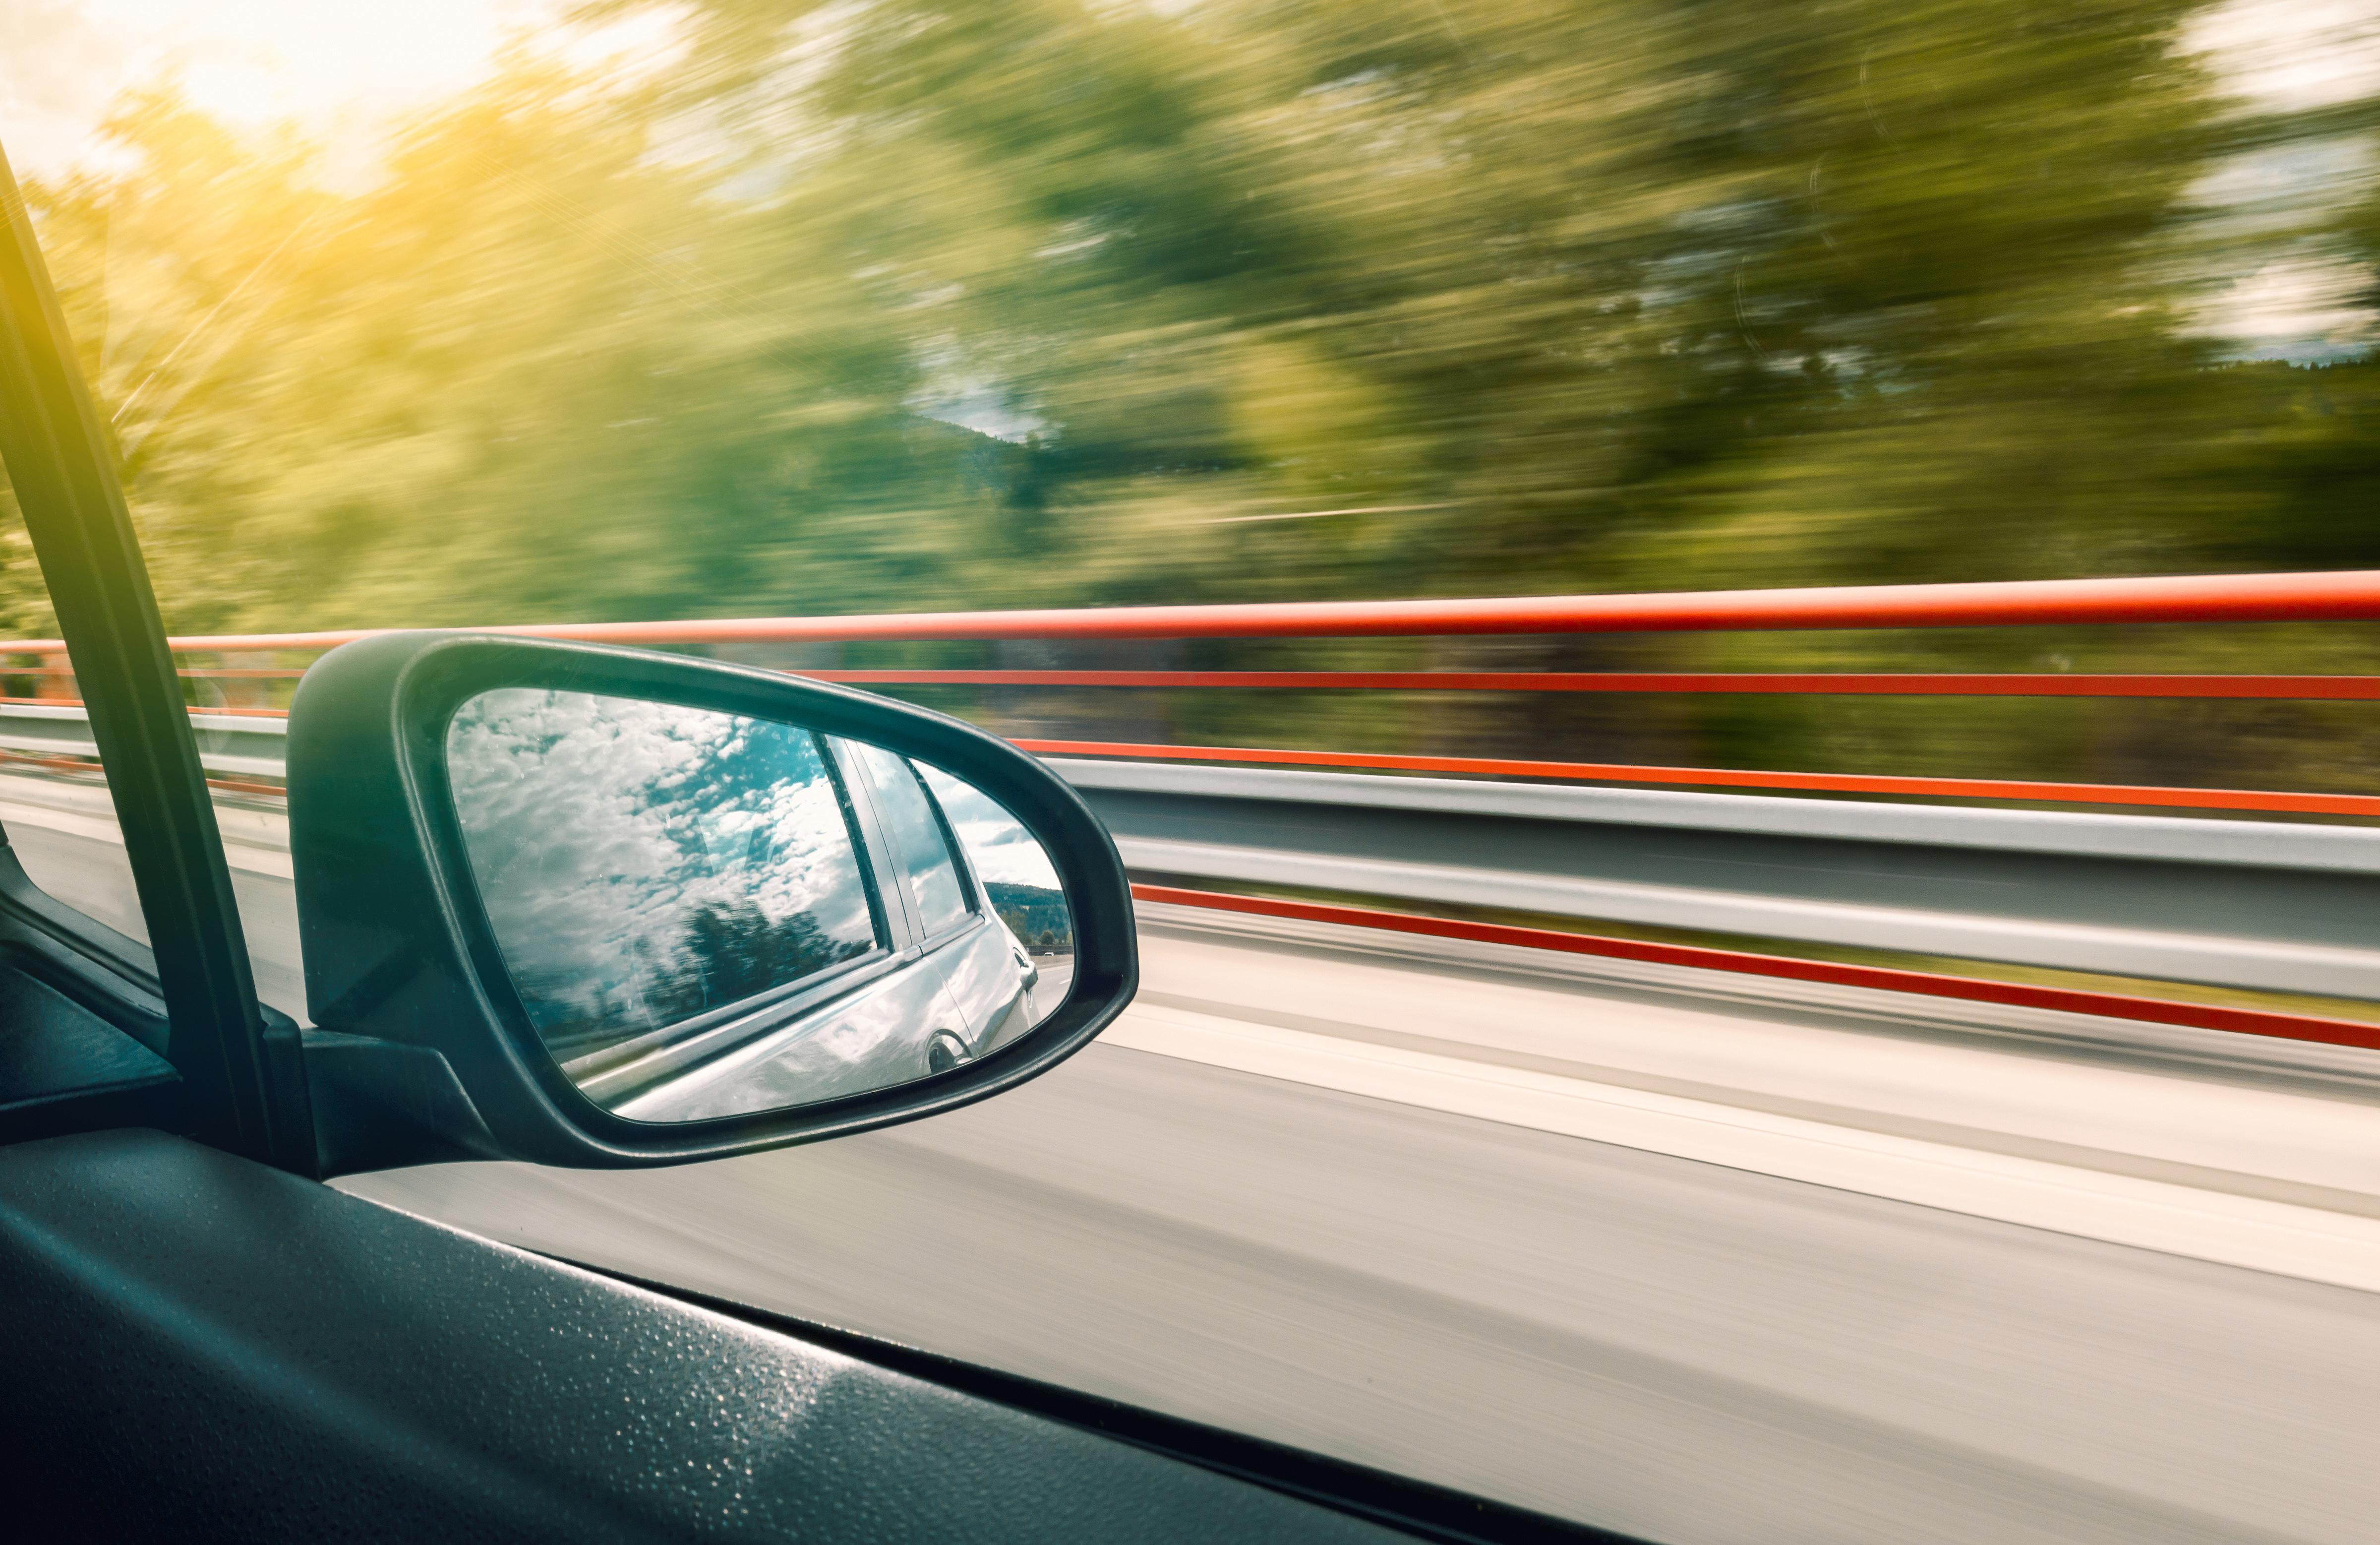 STARS impacts, car, road